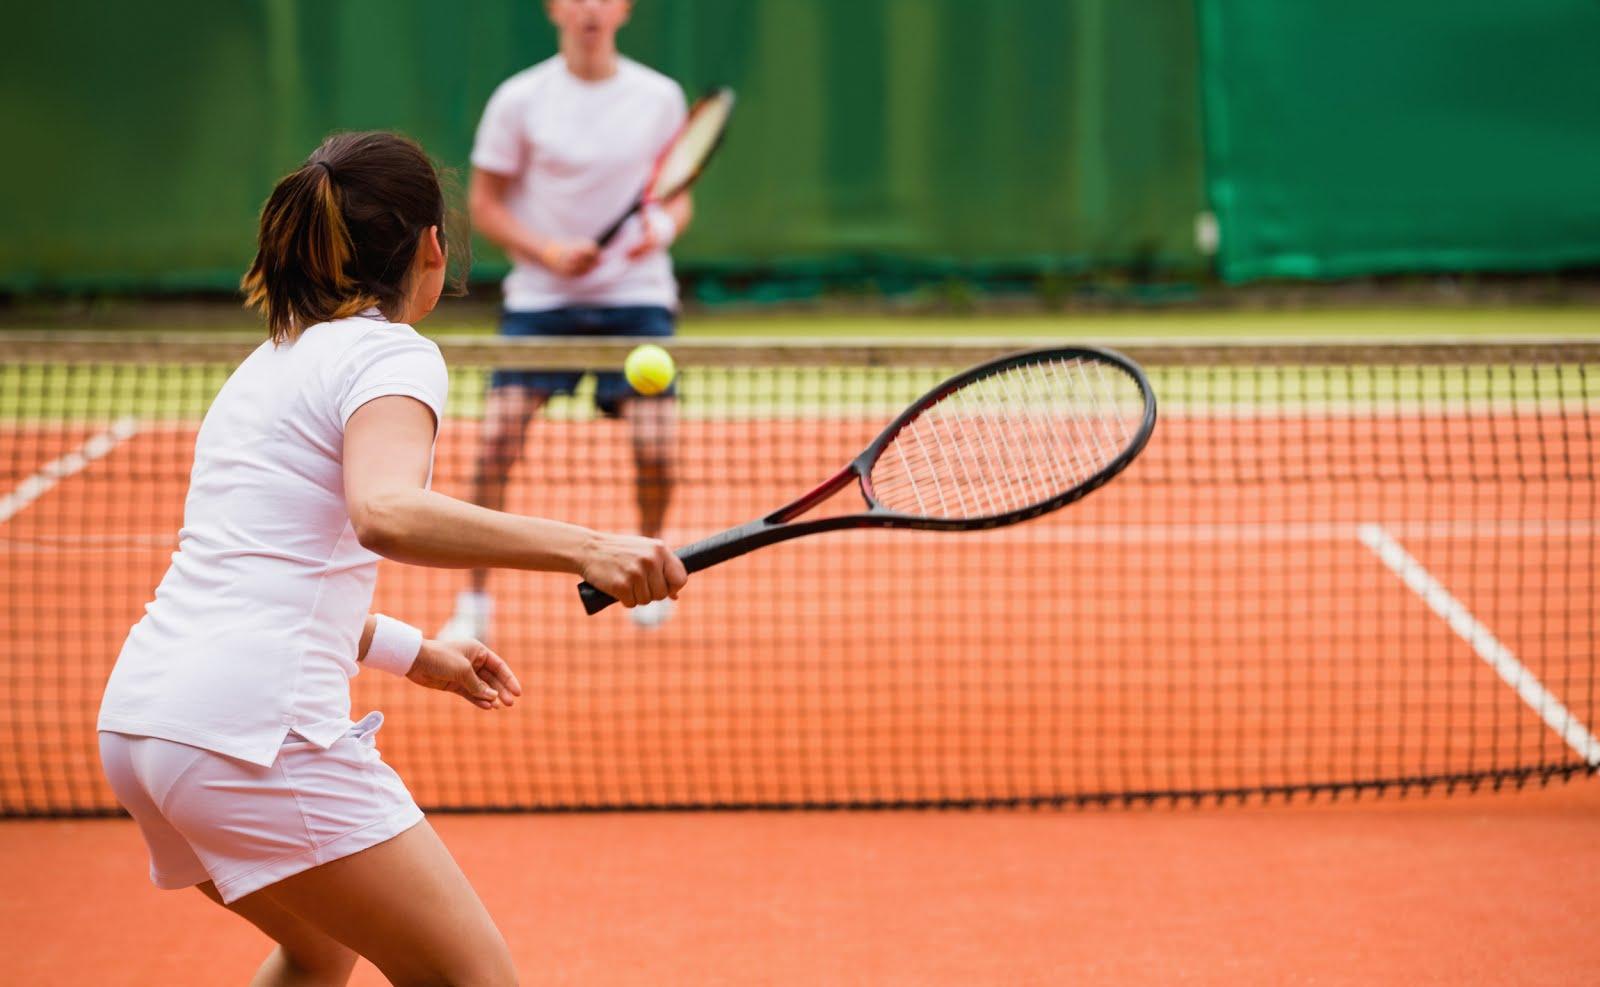 Фото детей играющих в теннис